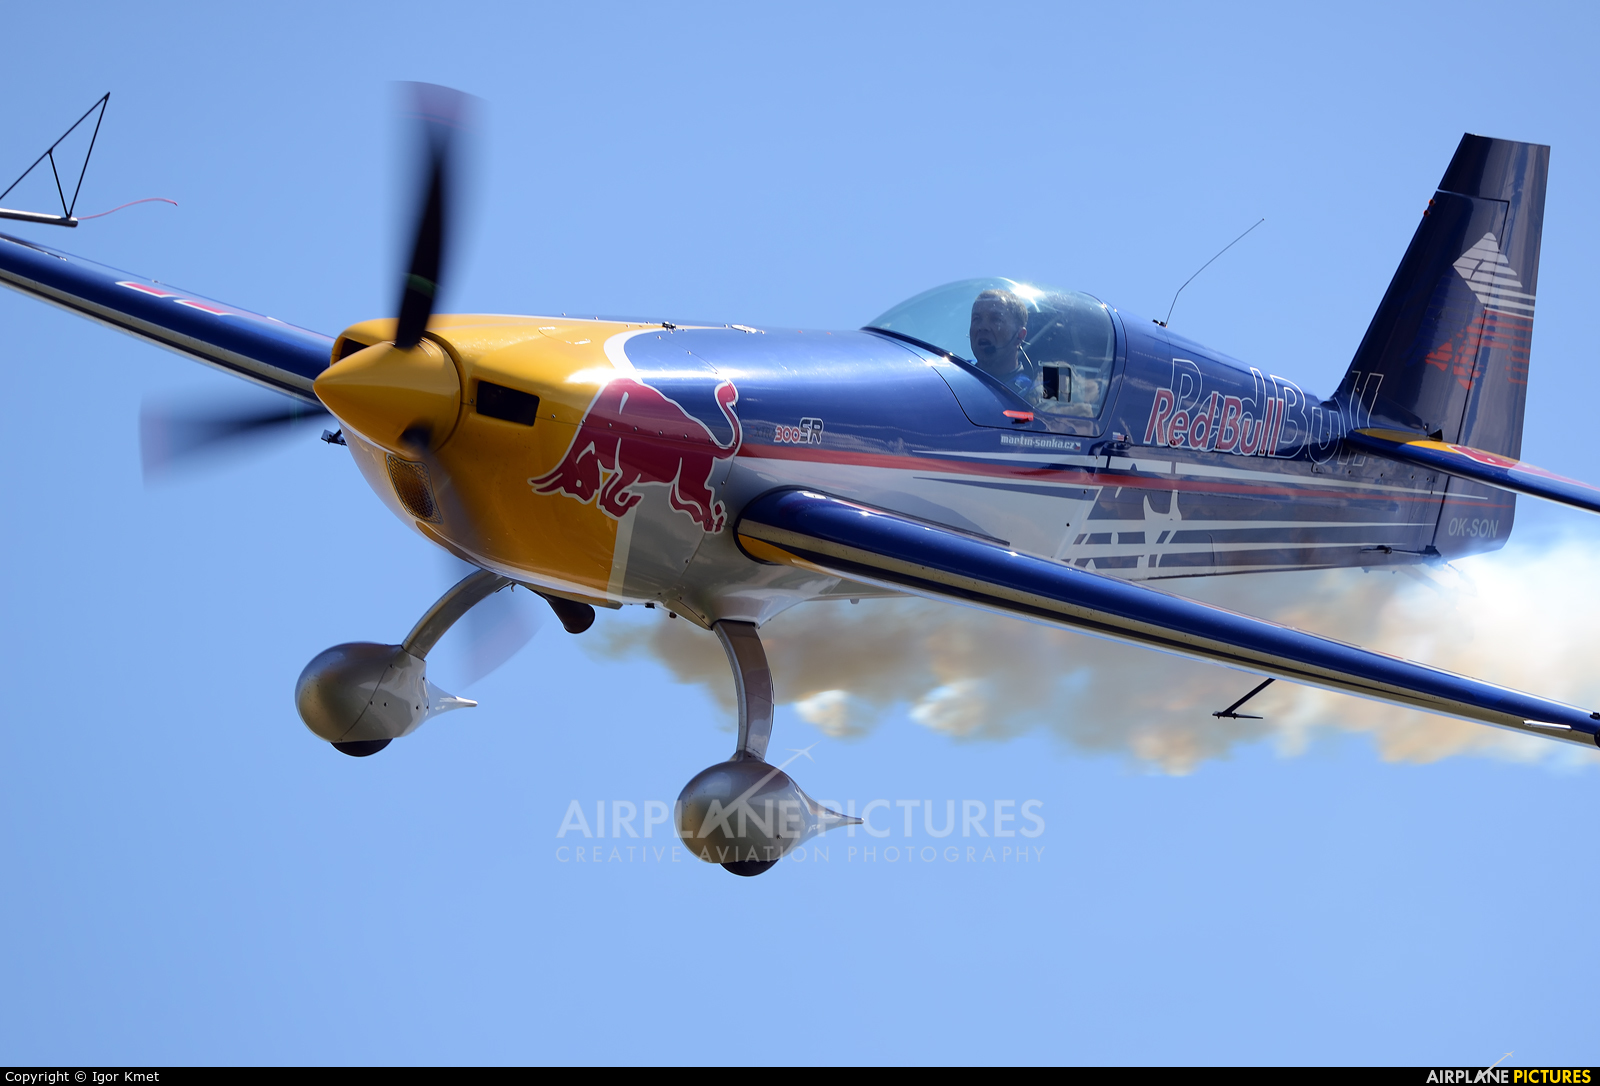 The Flying Bulls OK-SON aircraft at Dubová